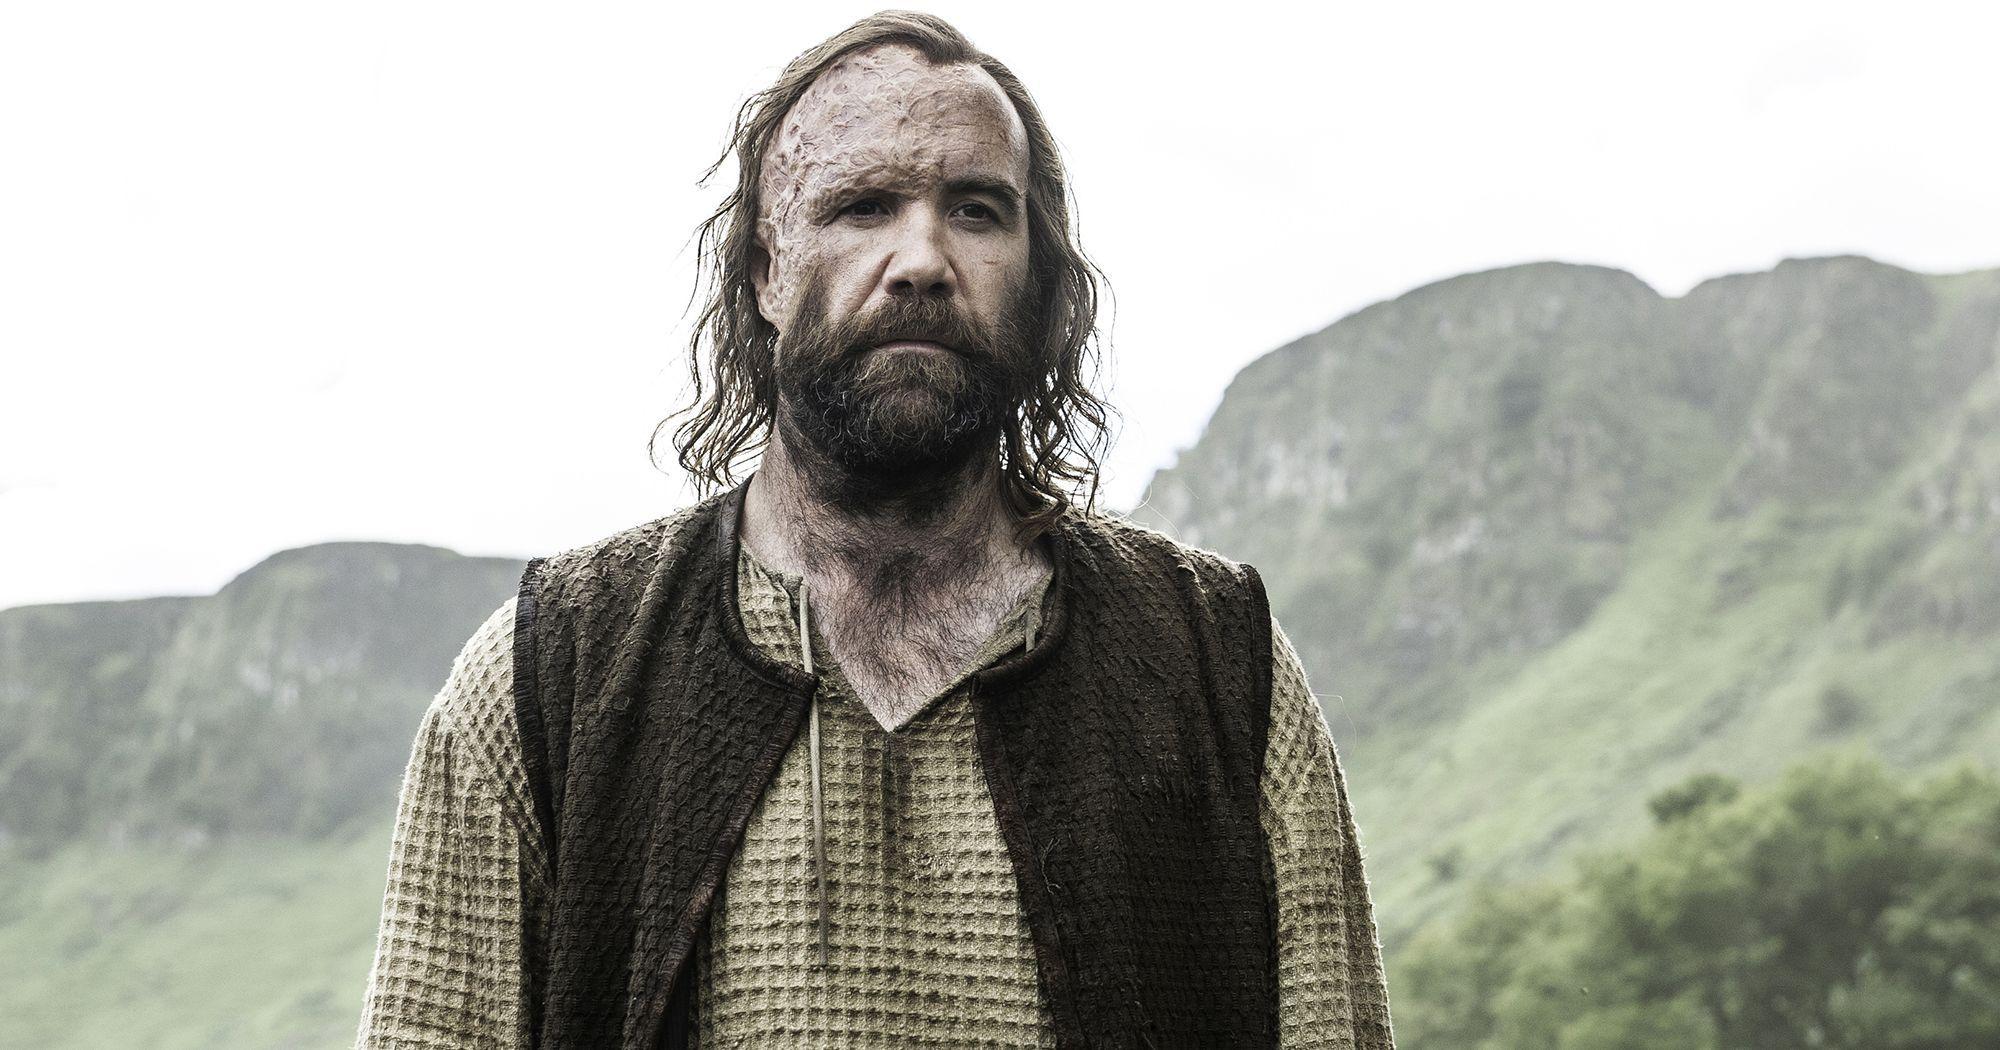 game-of-thrones-season-8-the-hound-cleganebowl-sandor